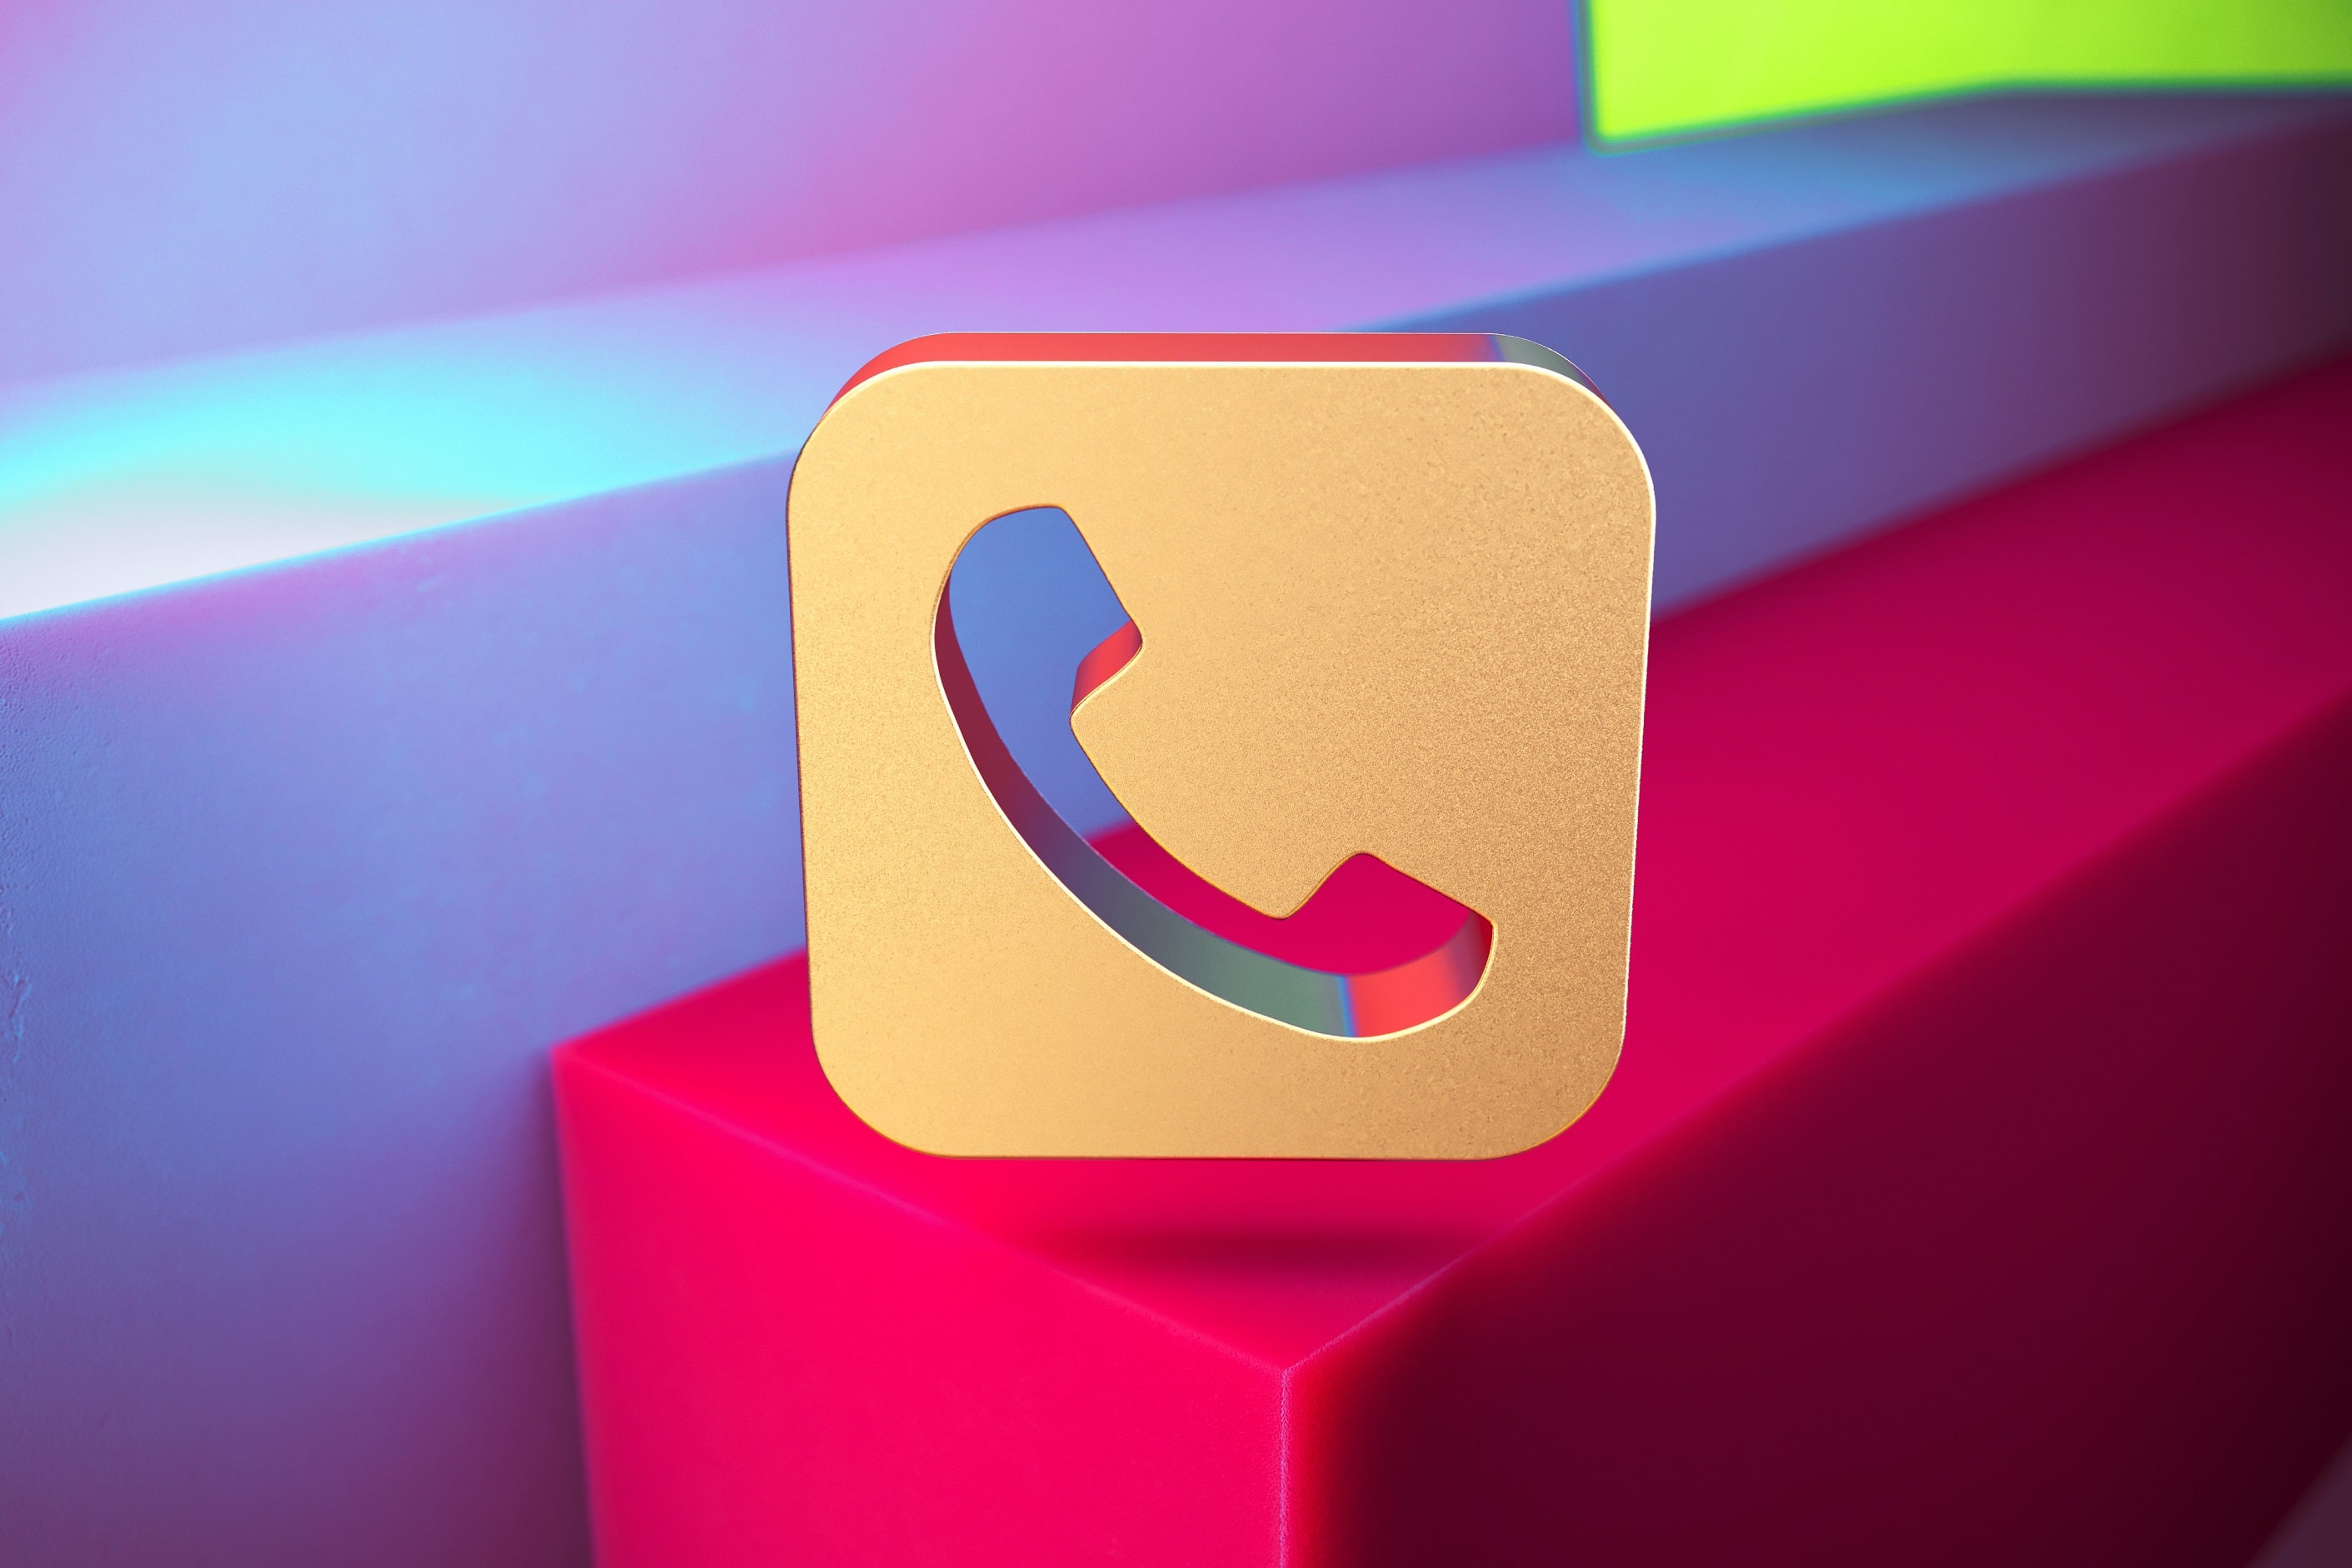 jpnumber(日本電話番号検索)の口コミを削除する方法